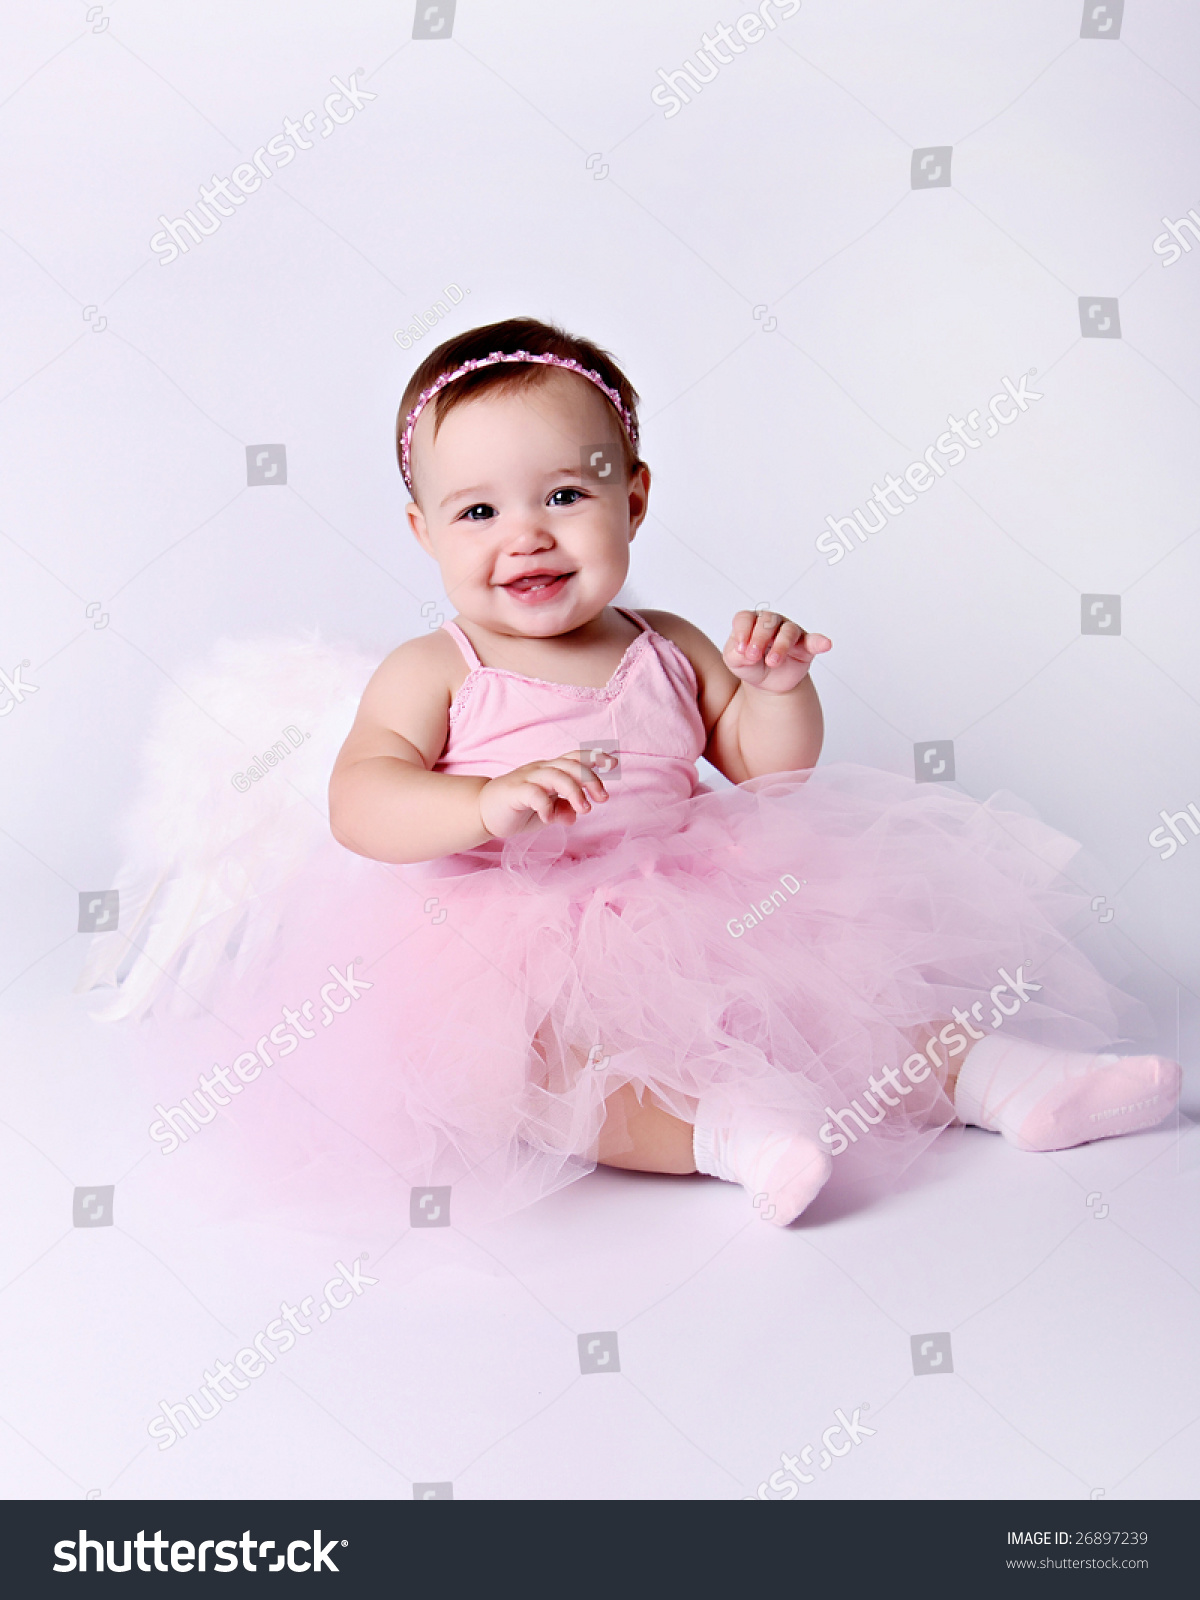 Baby Girl Angel Ballerina Stock Photo 26897239 - Shutterstock